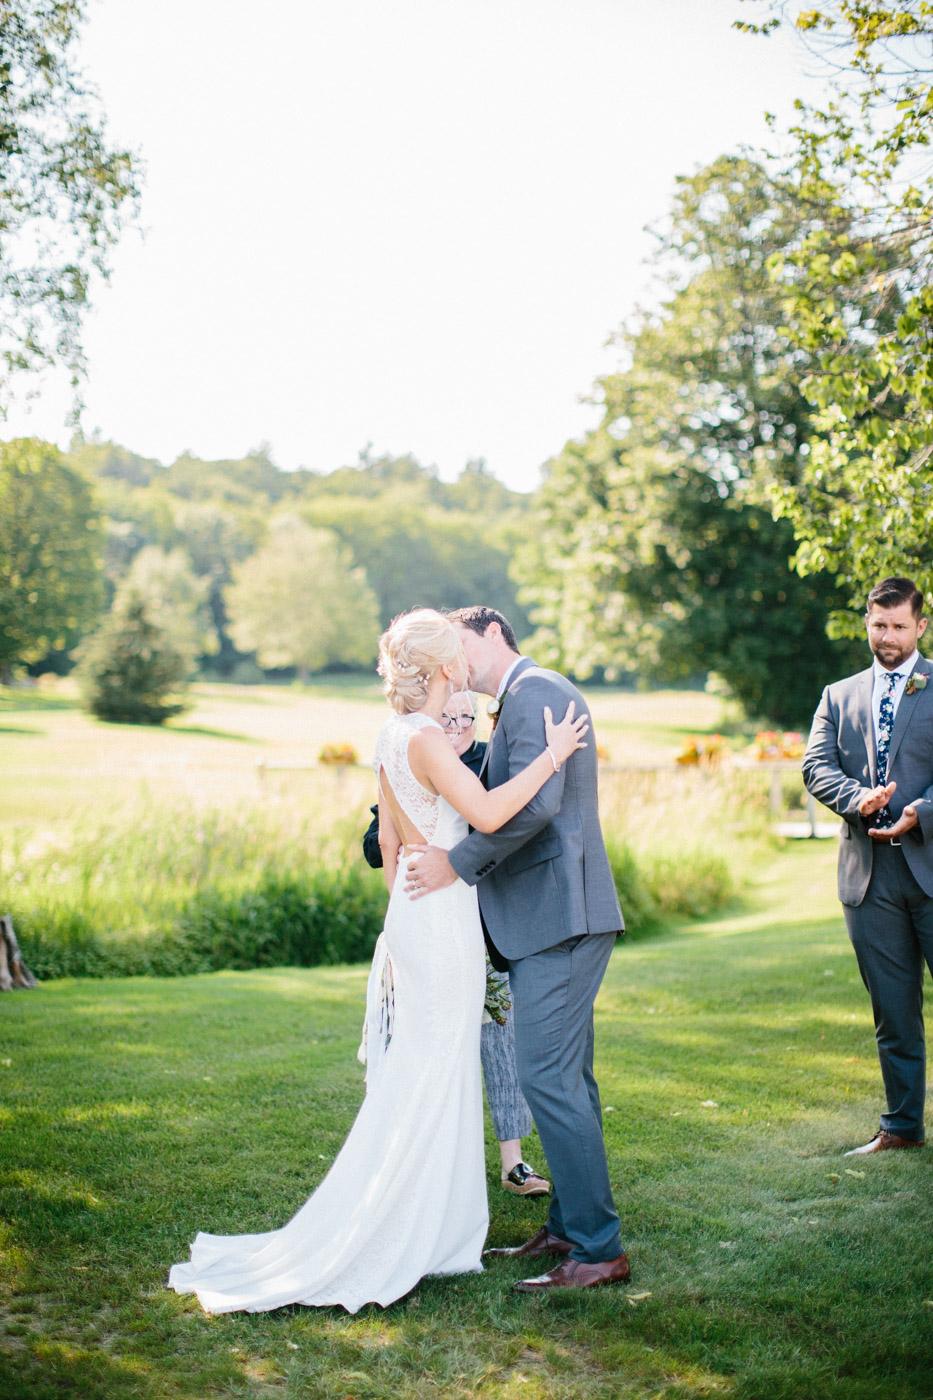 wedding_photography_tips_best_photography_lighting-5.jpg